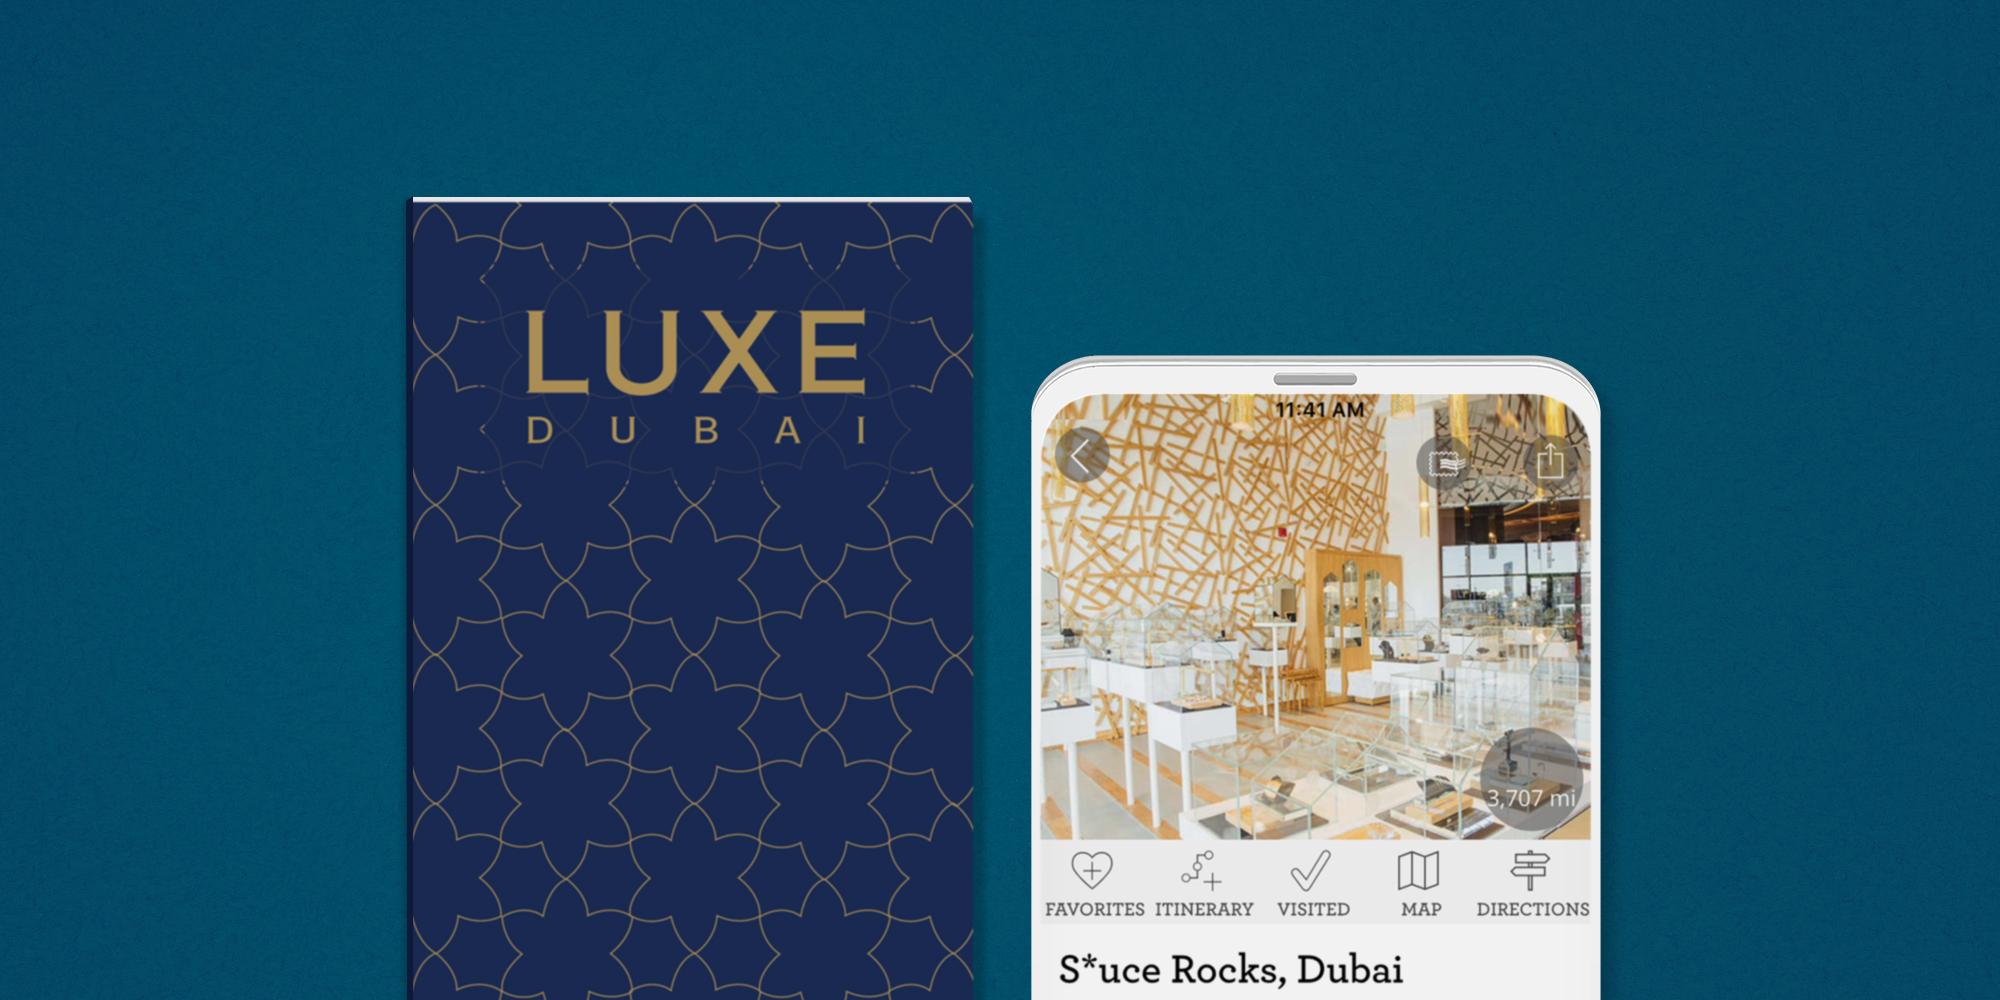 Dubai print guide and digital guide